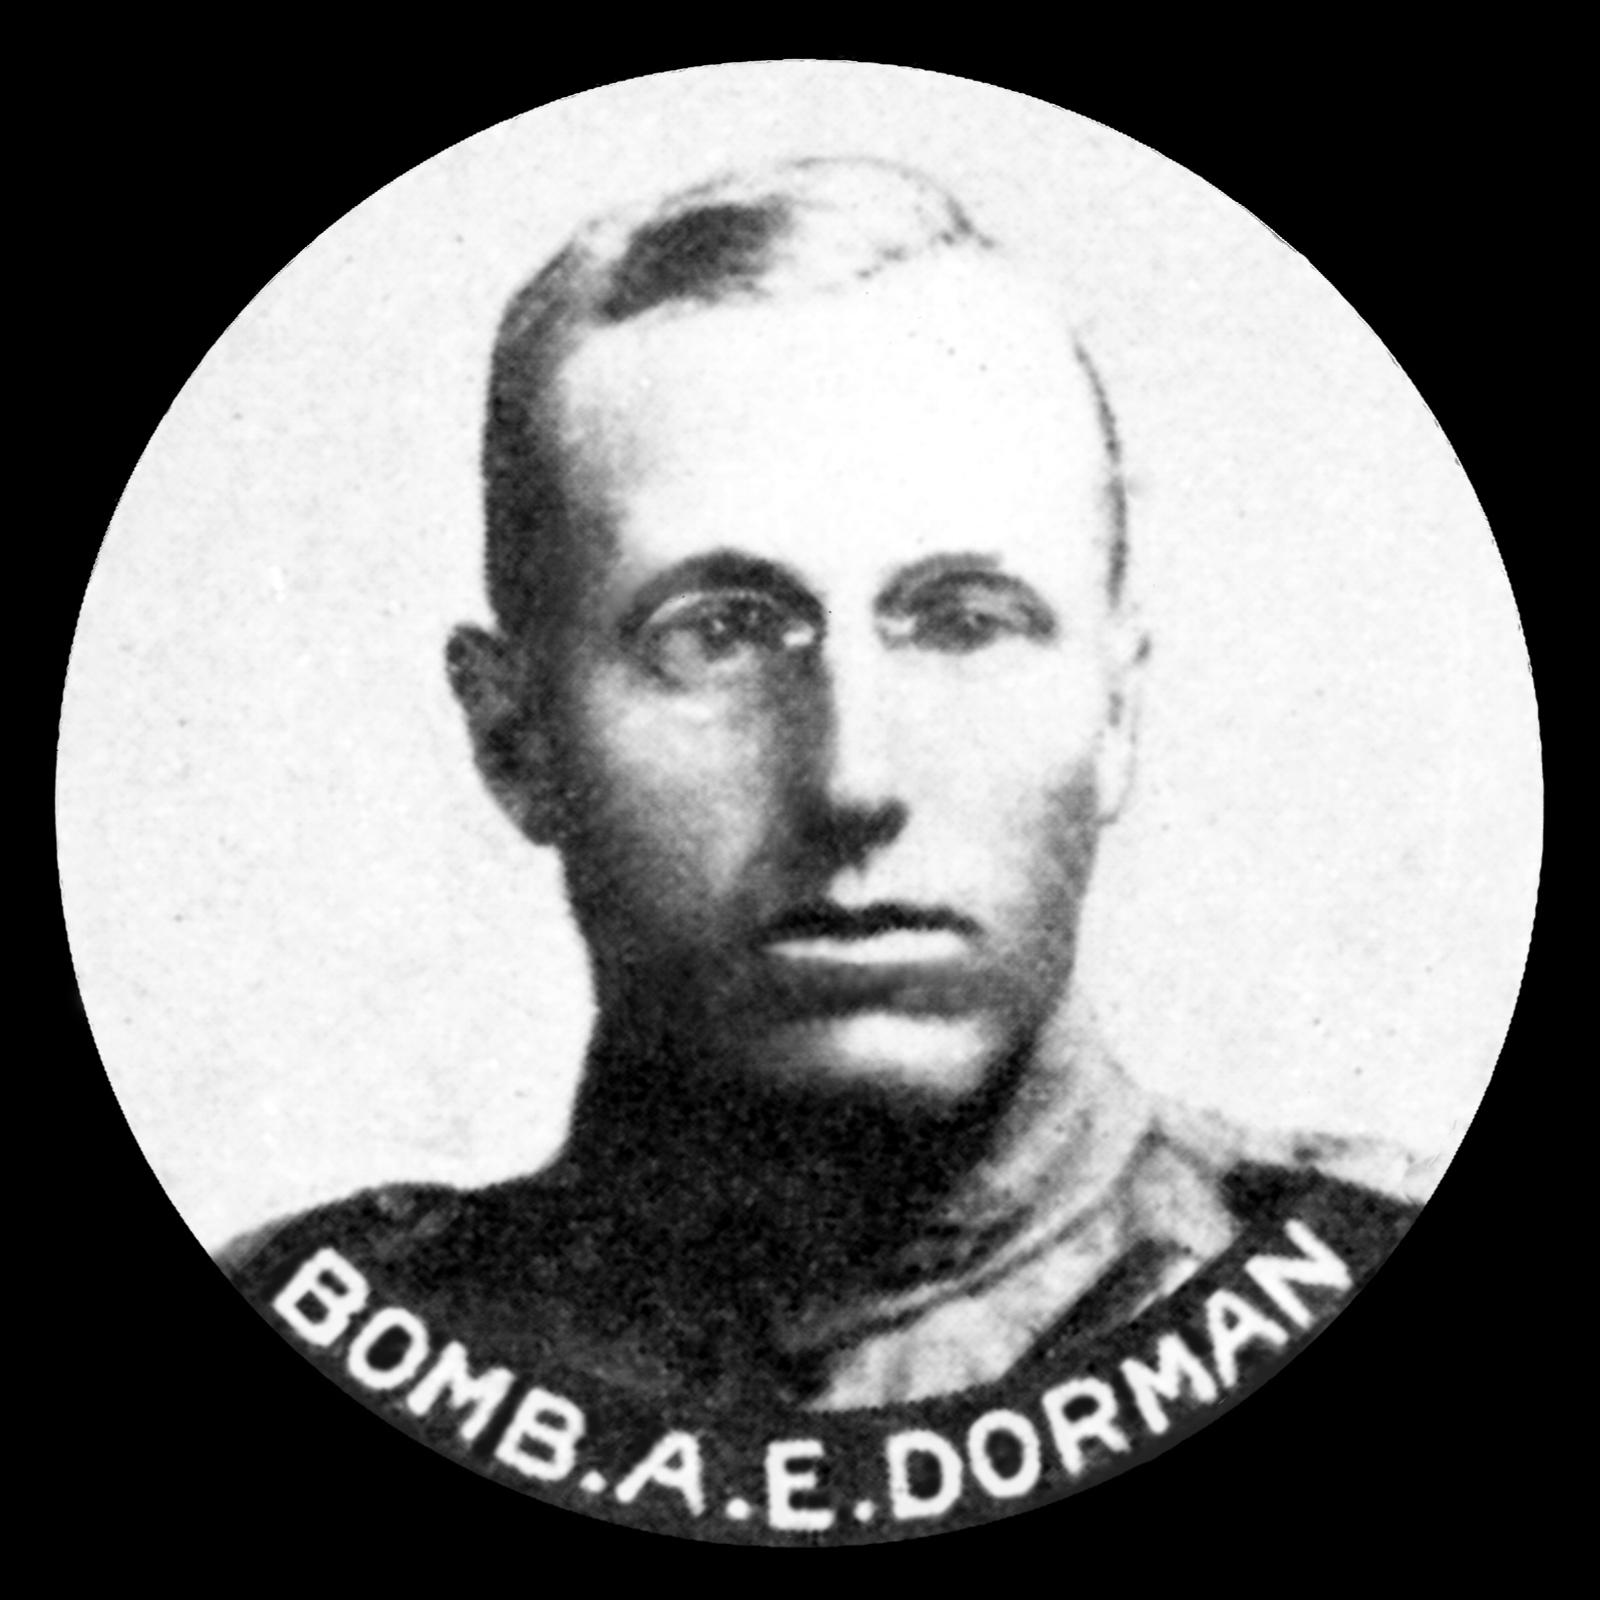 DORMAN Arthur Edward